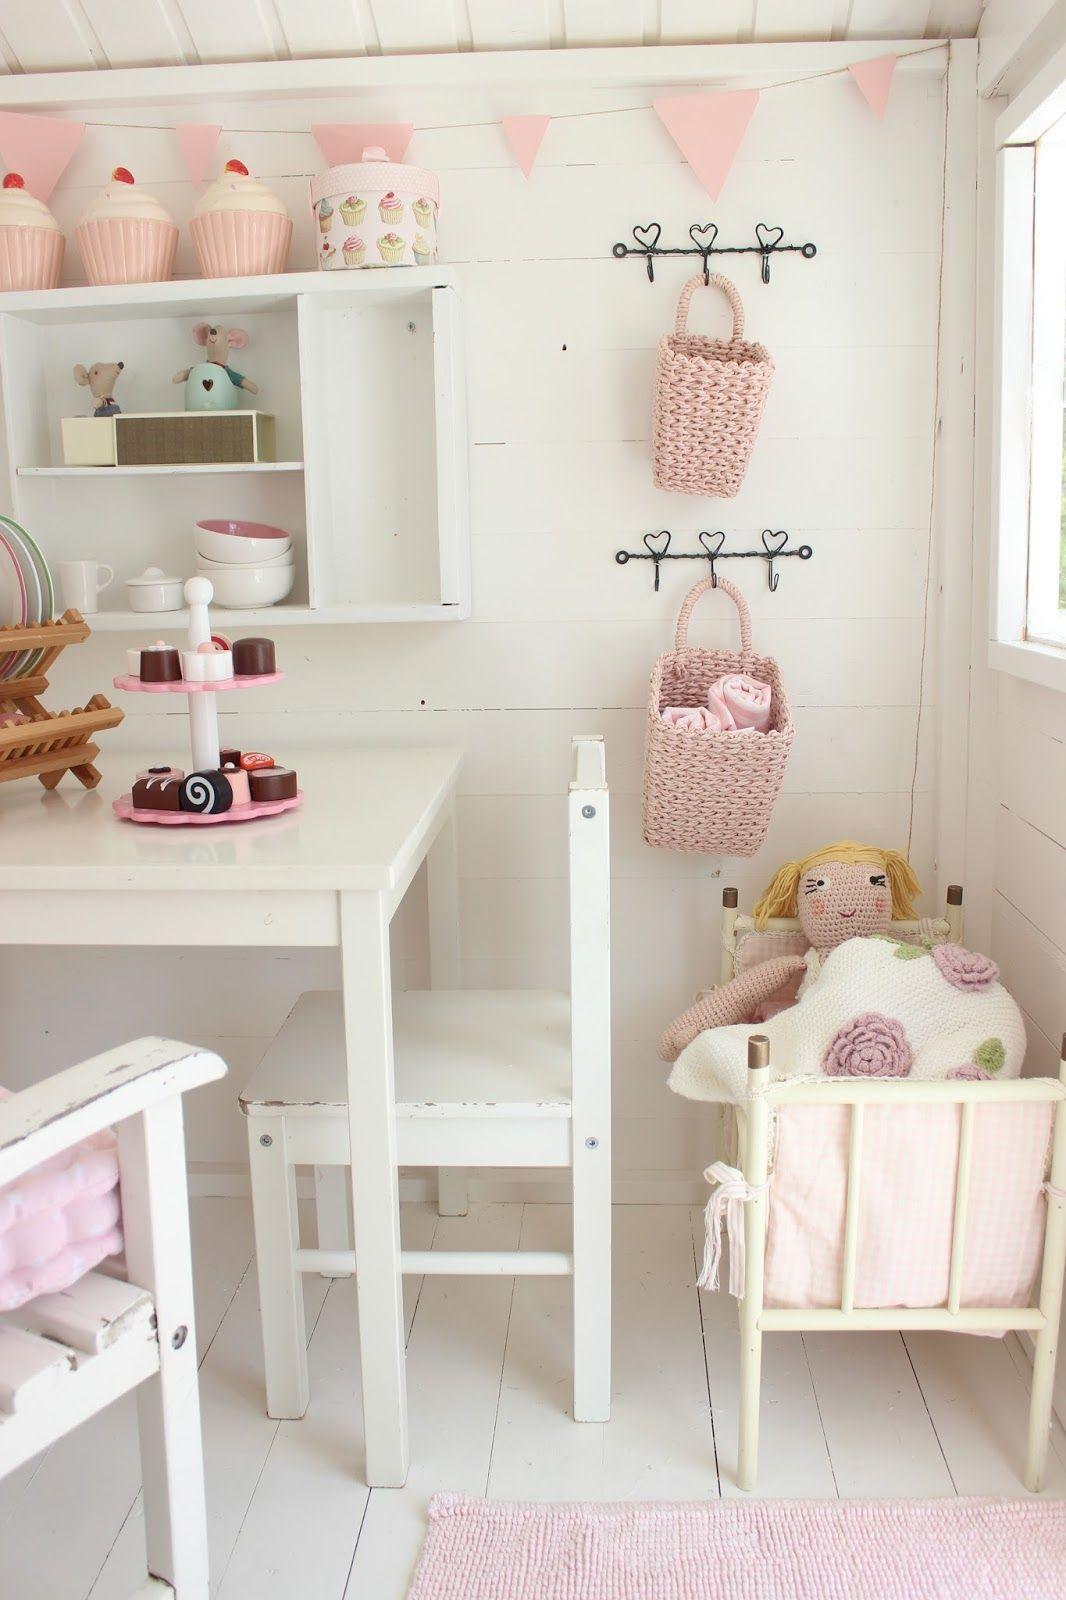 Jeanette  hus josefine sitt lille krypinn painted playhouse pink also eanette  us  rnev relse cubby houses play wendy house rh pinterest